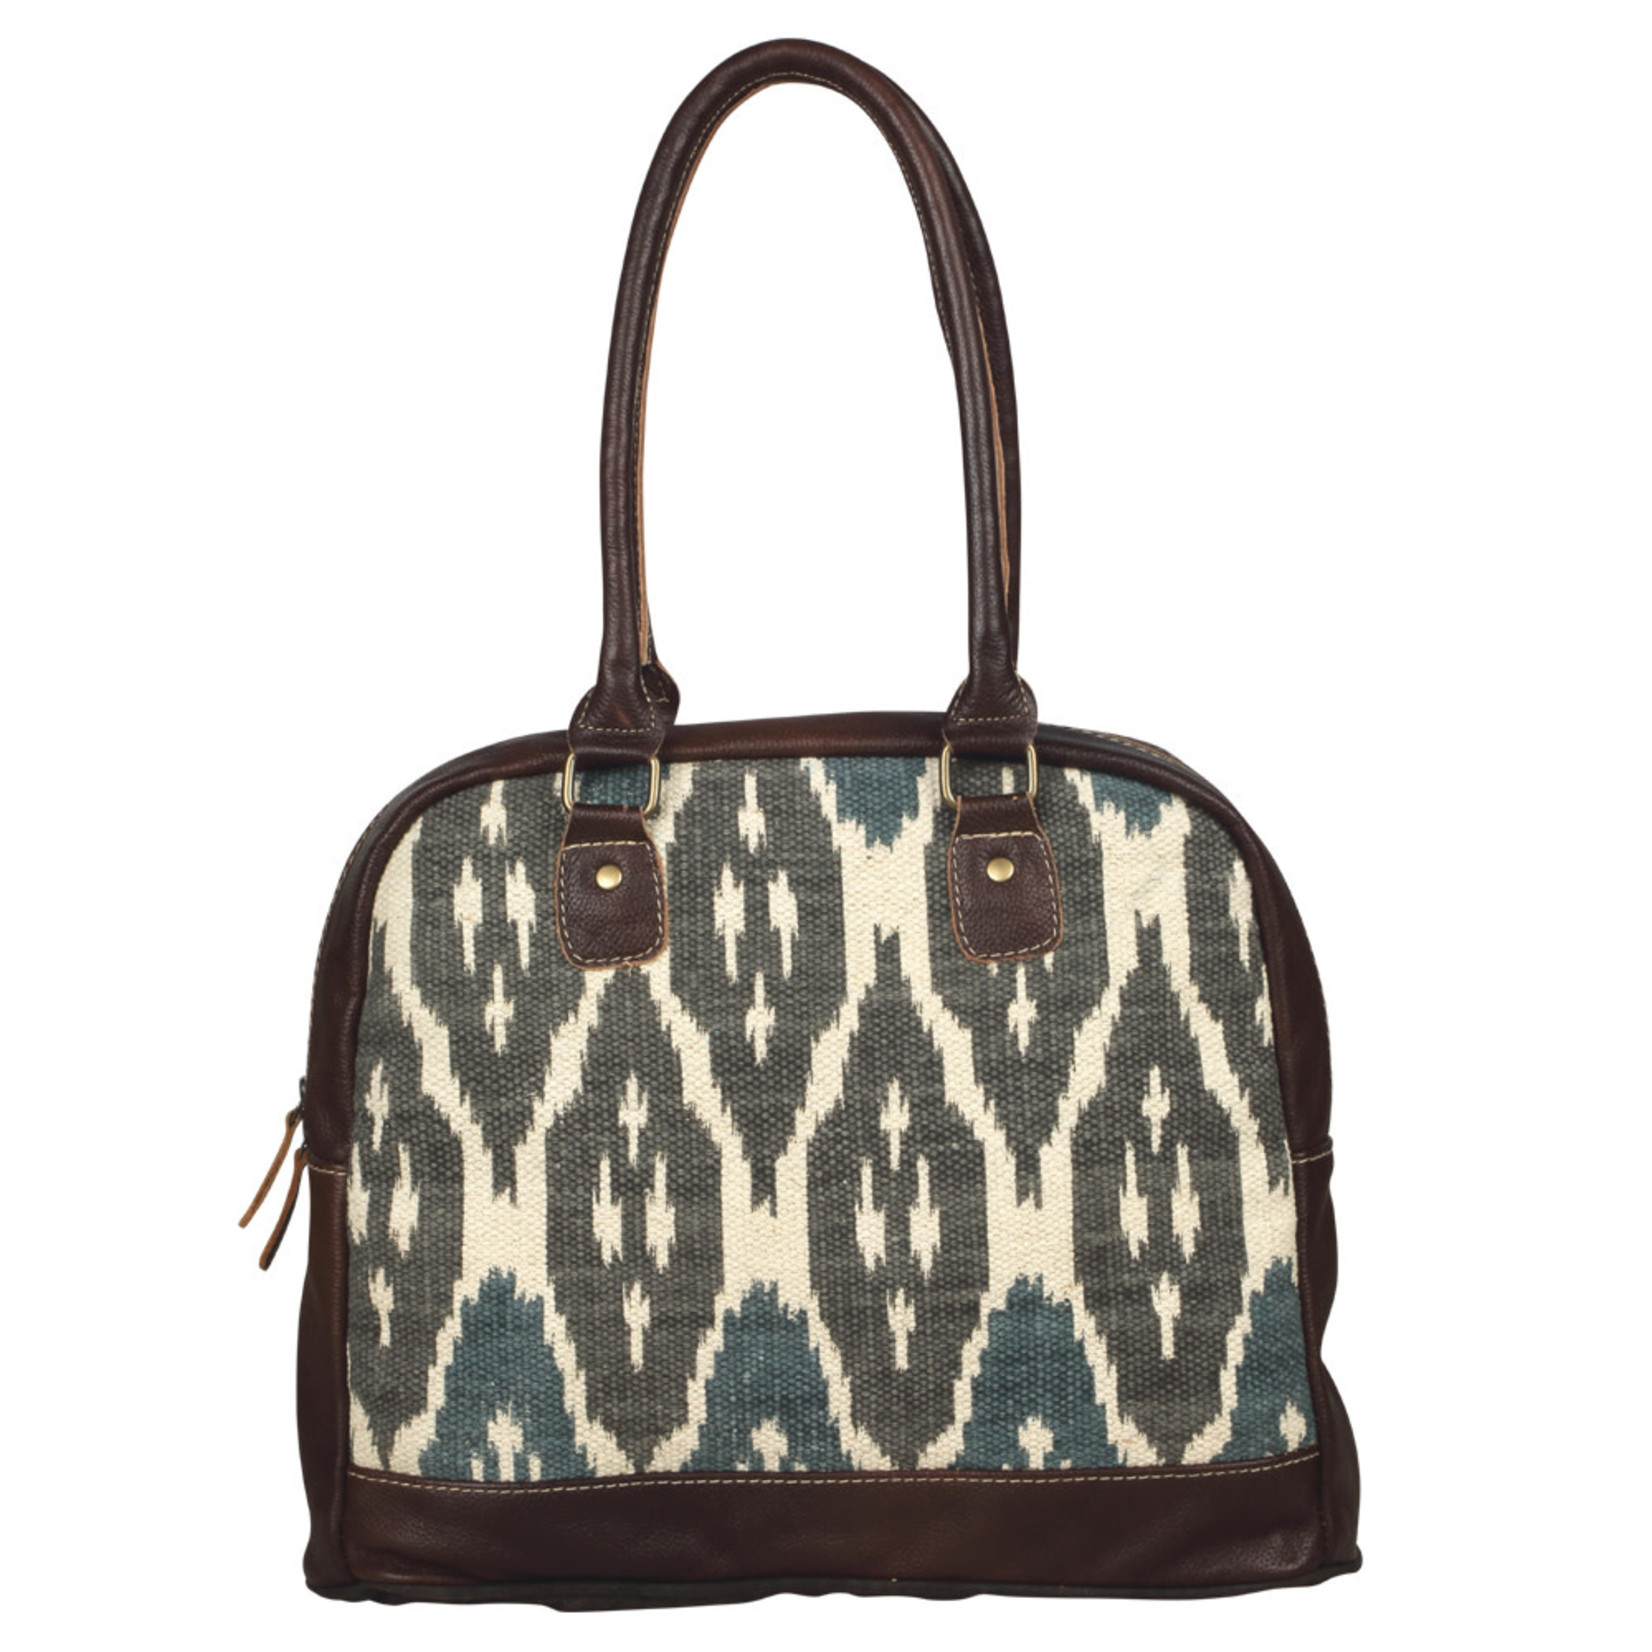 Myra Bags S-2088 Bag Devours Tote Bag